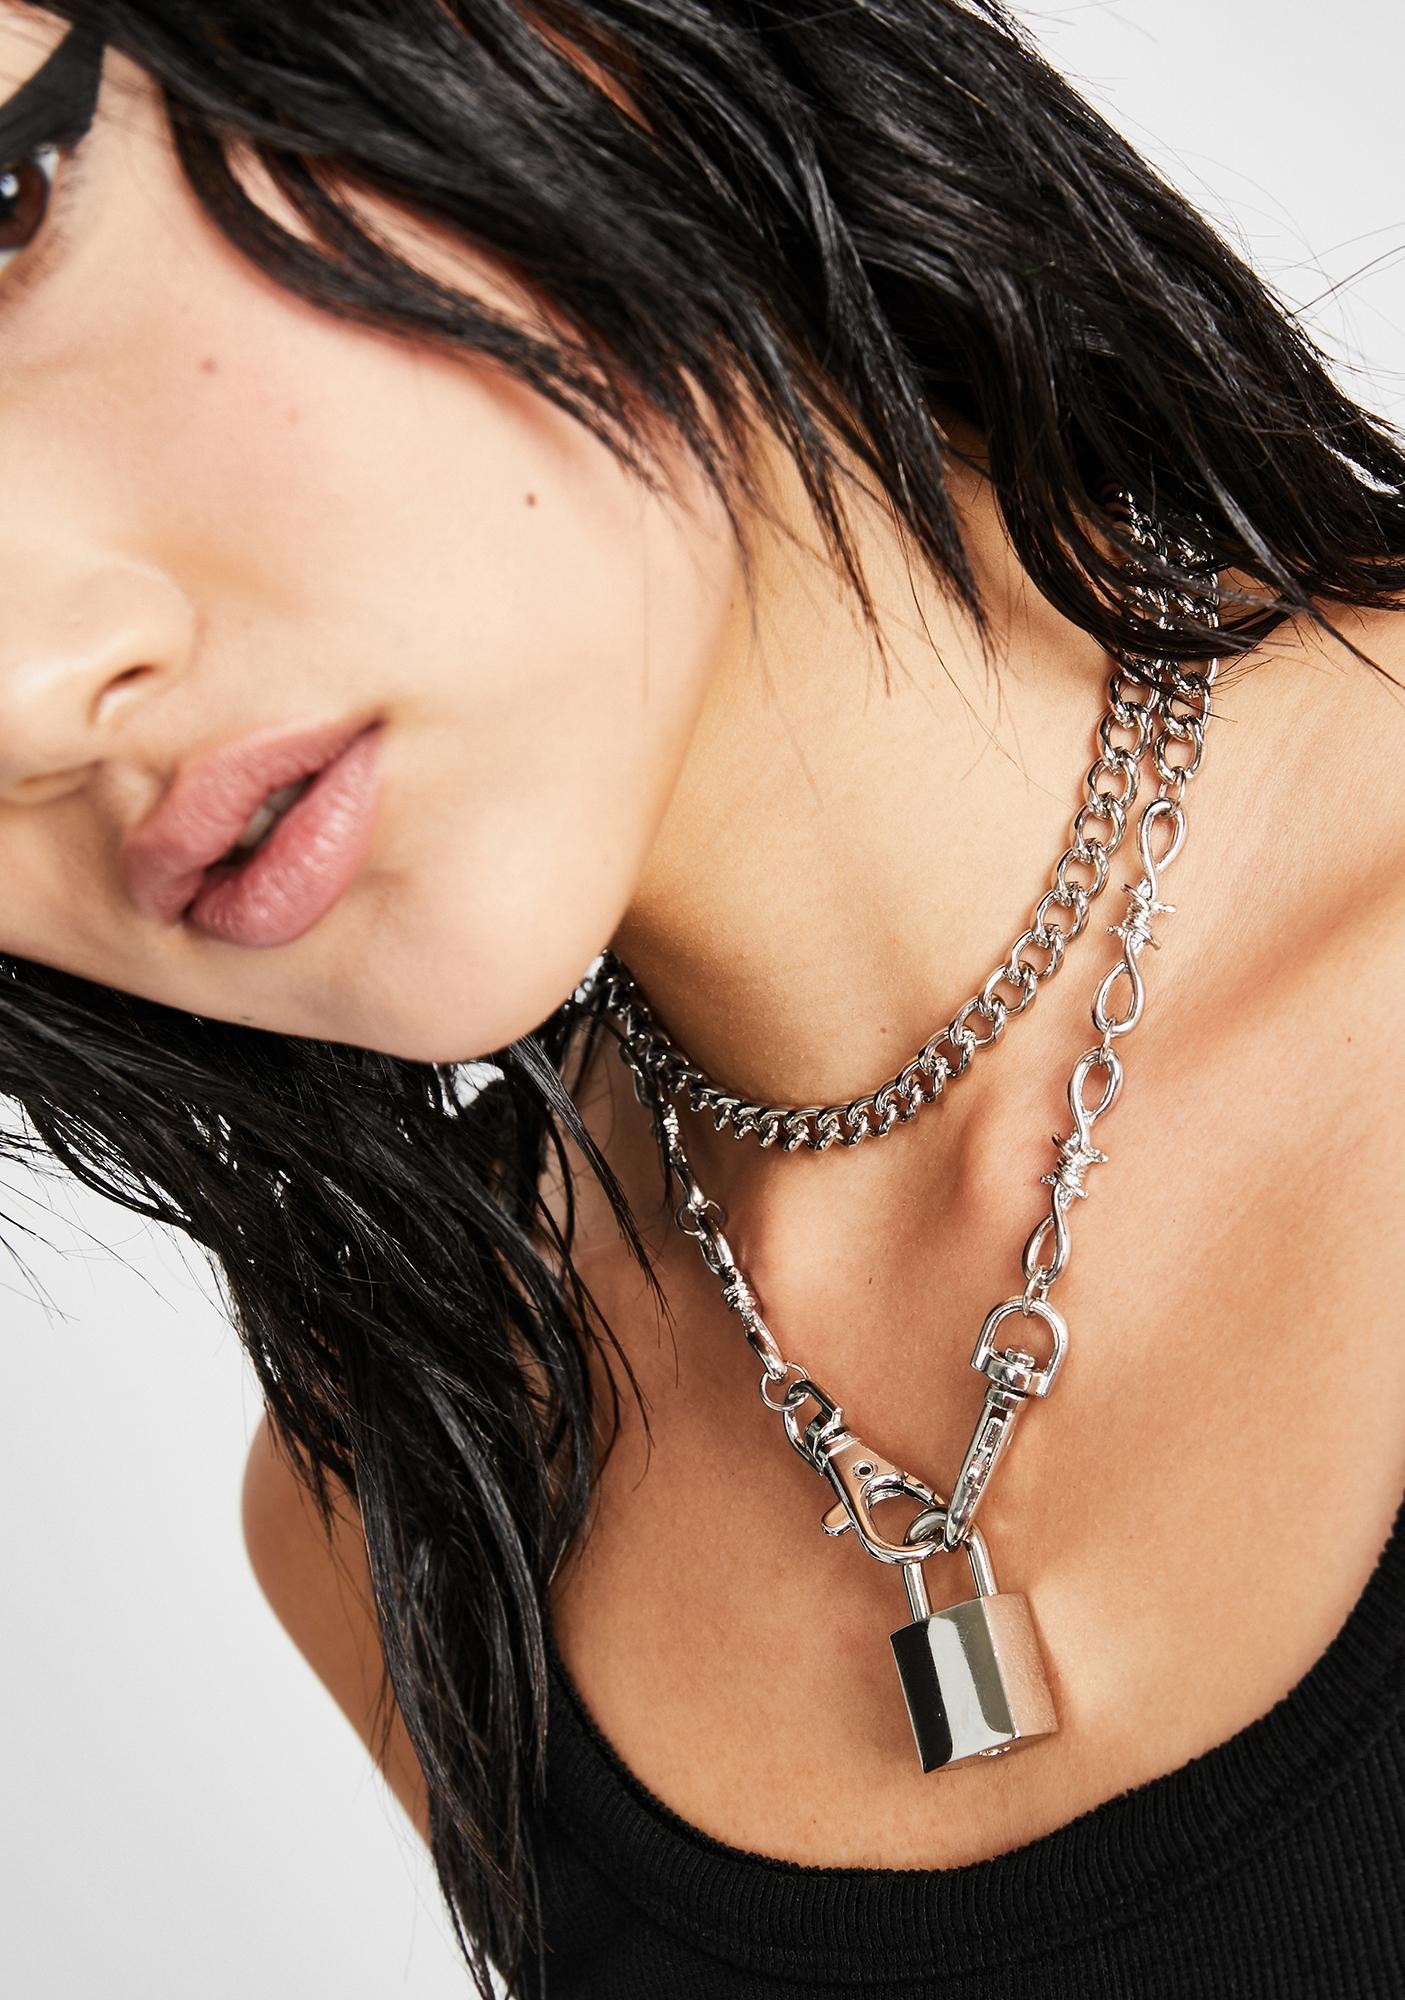 Harsh Judgement Lock Necklace